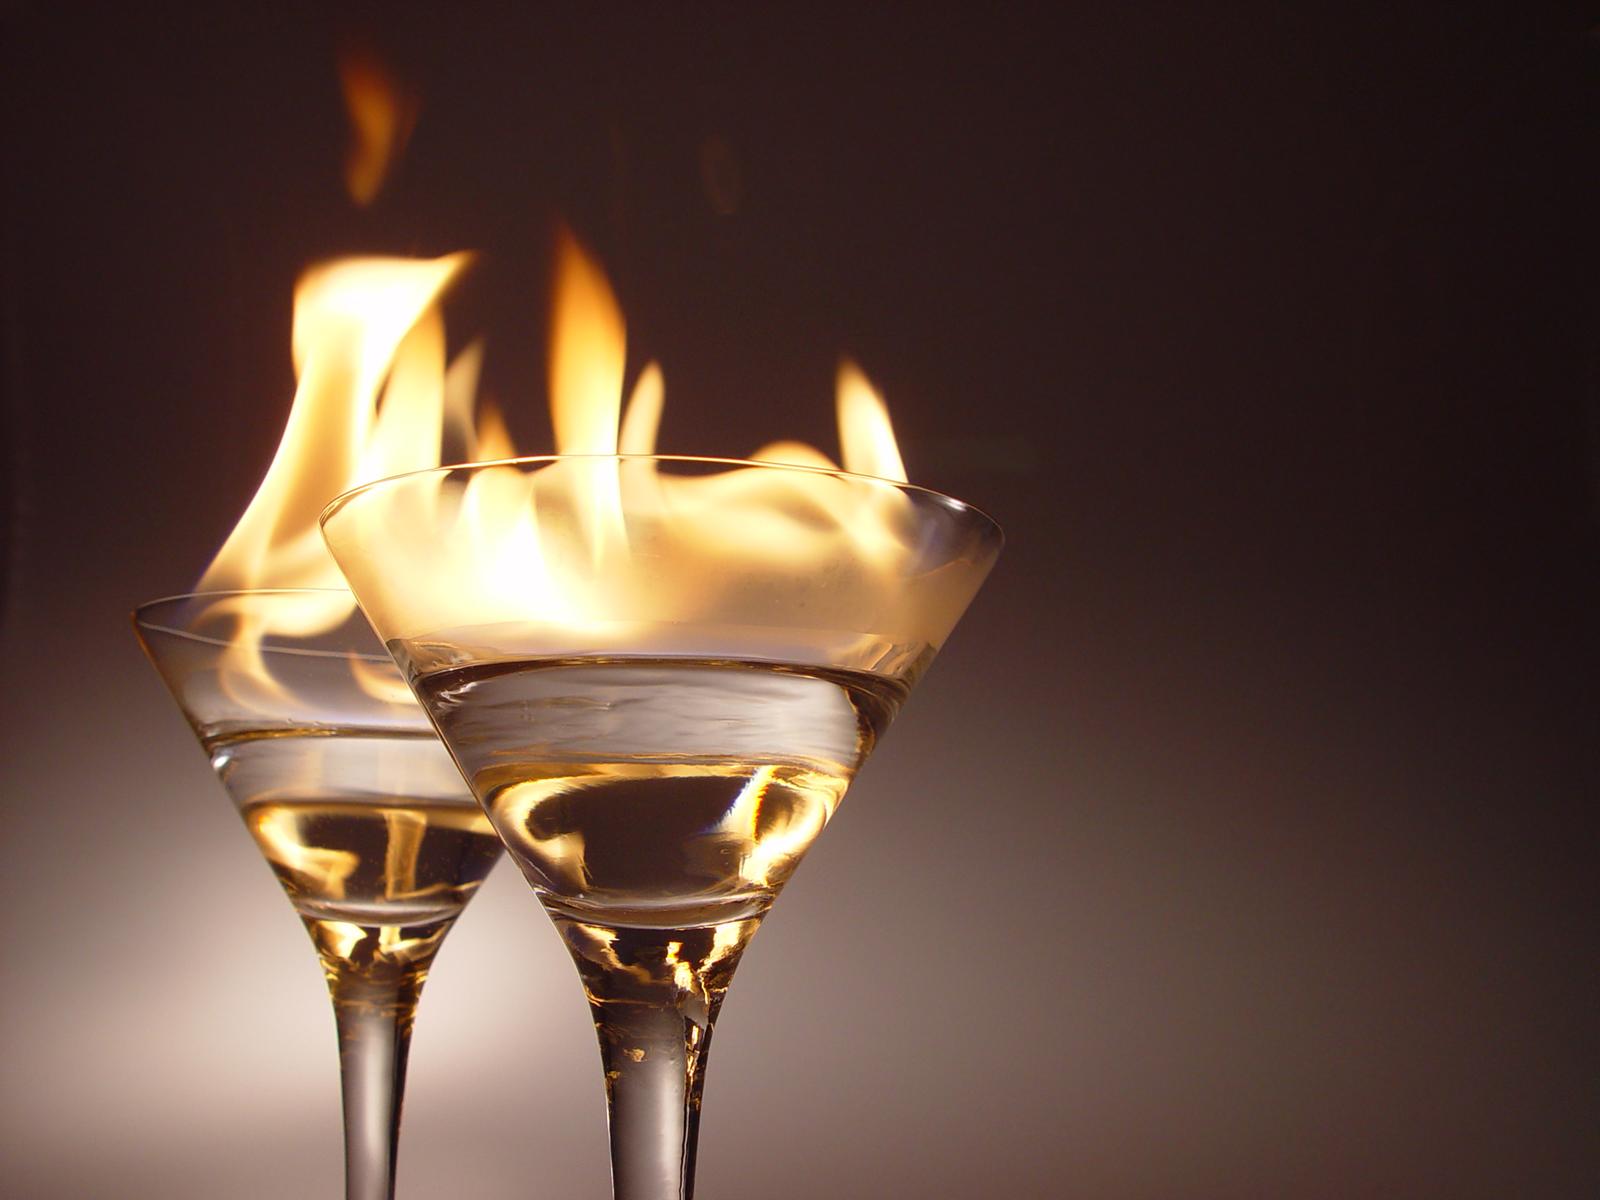 Bacardi pegando fogo